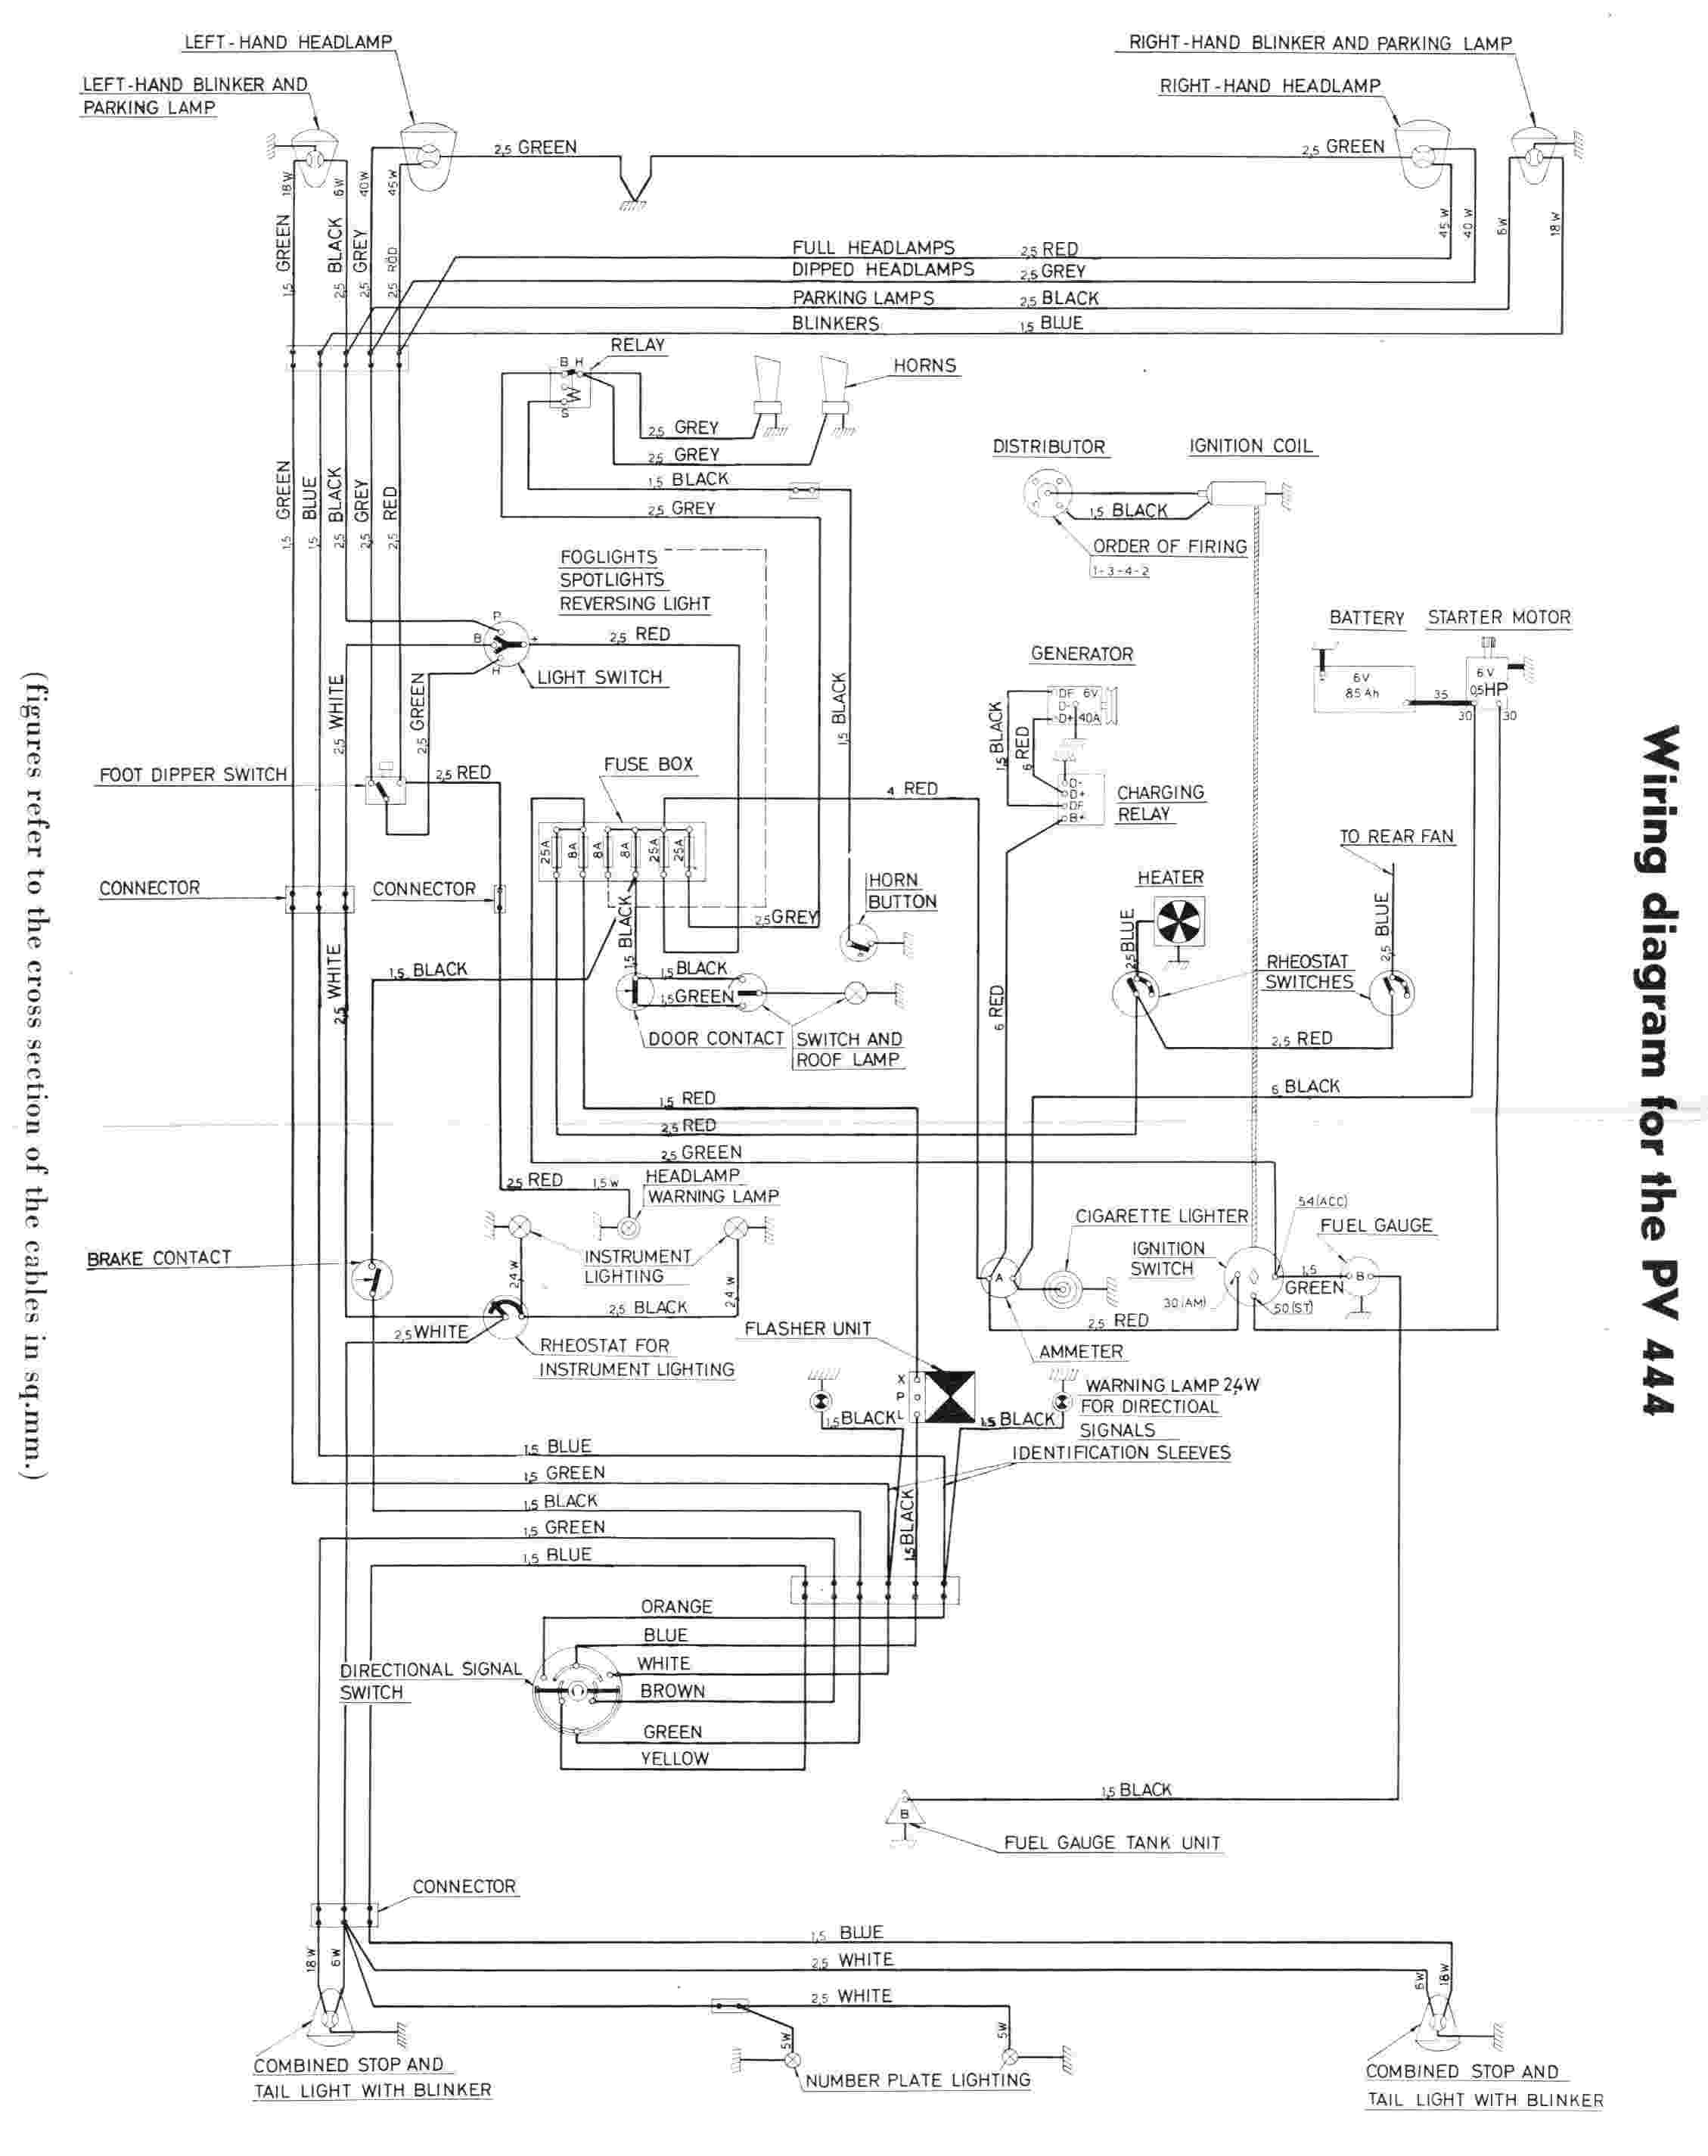 Volvo Alternator Wiring Diagram Free Download Wiring Diagram